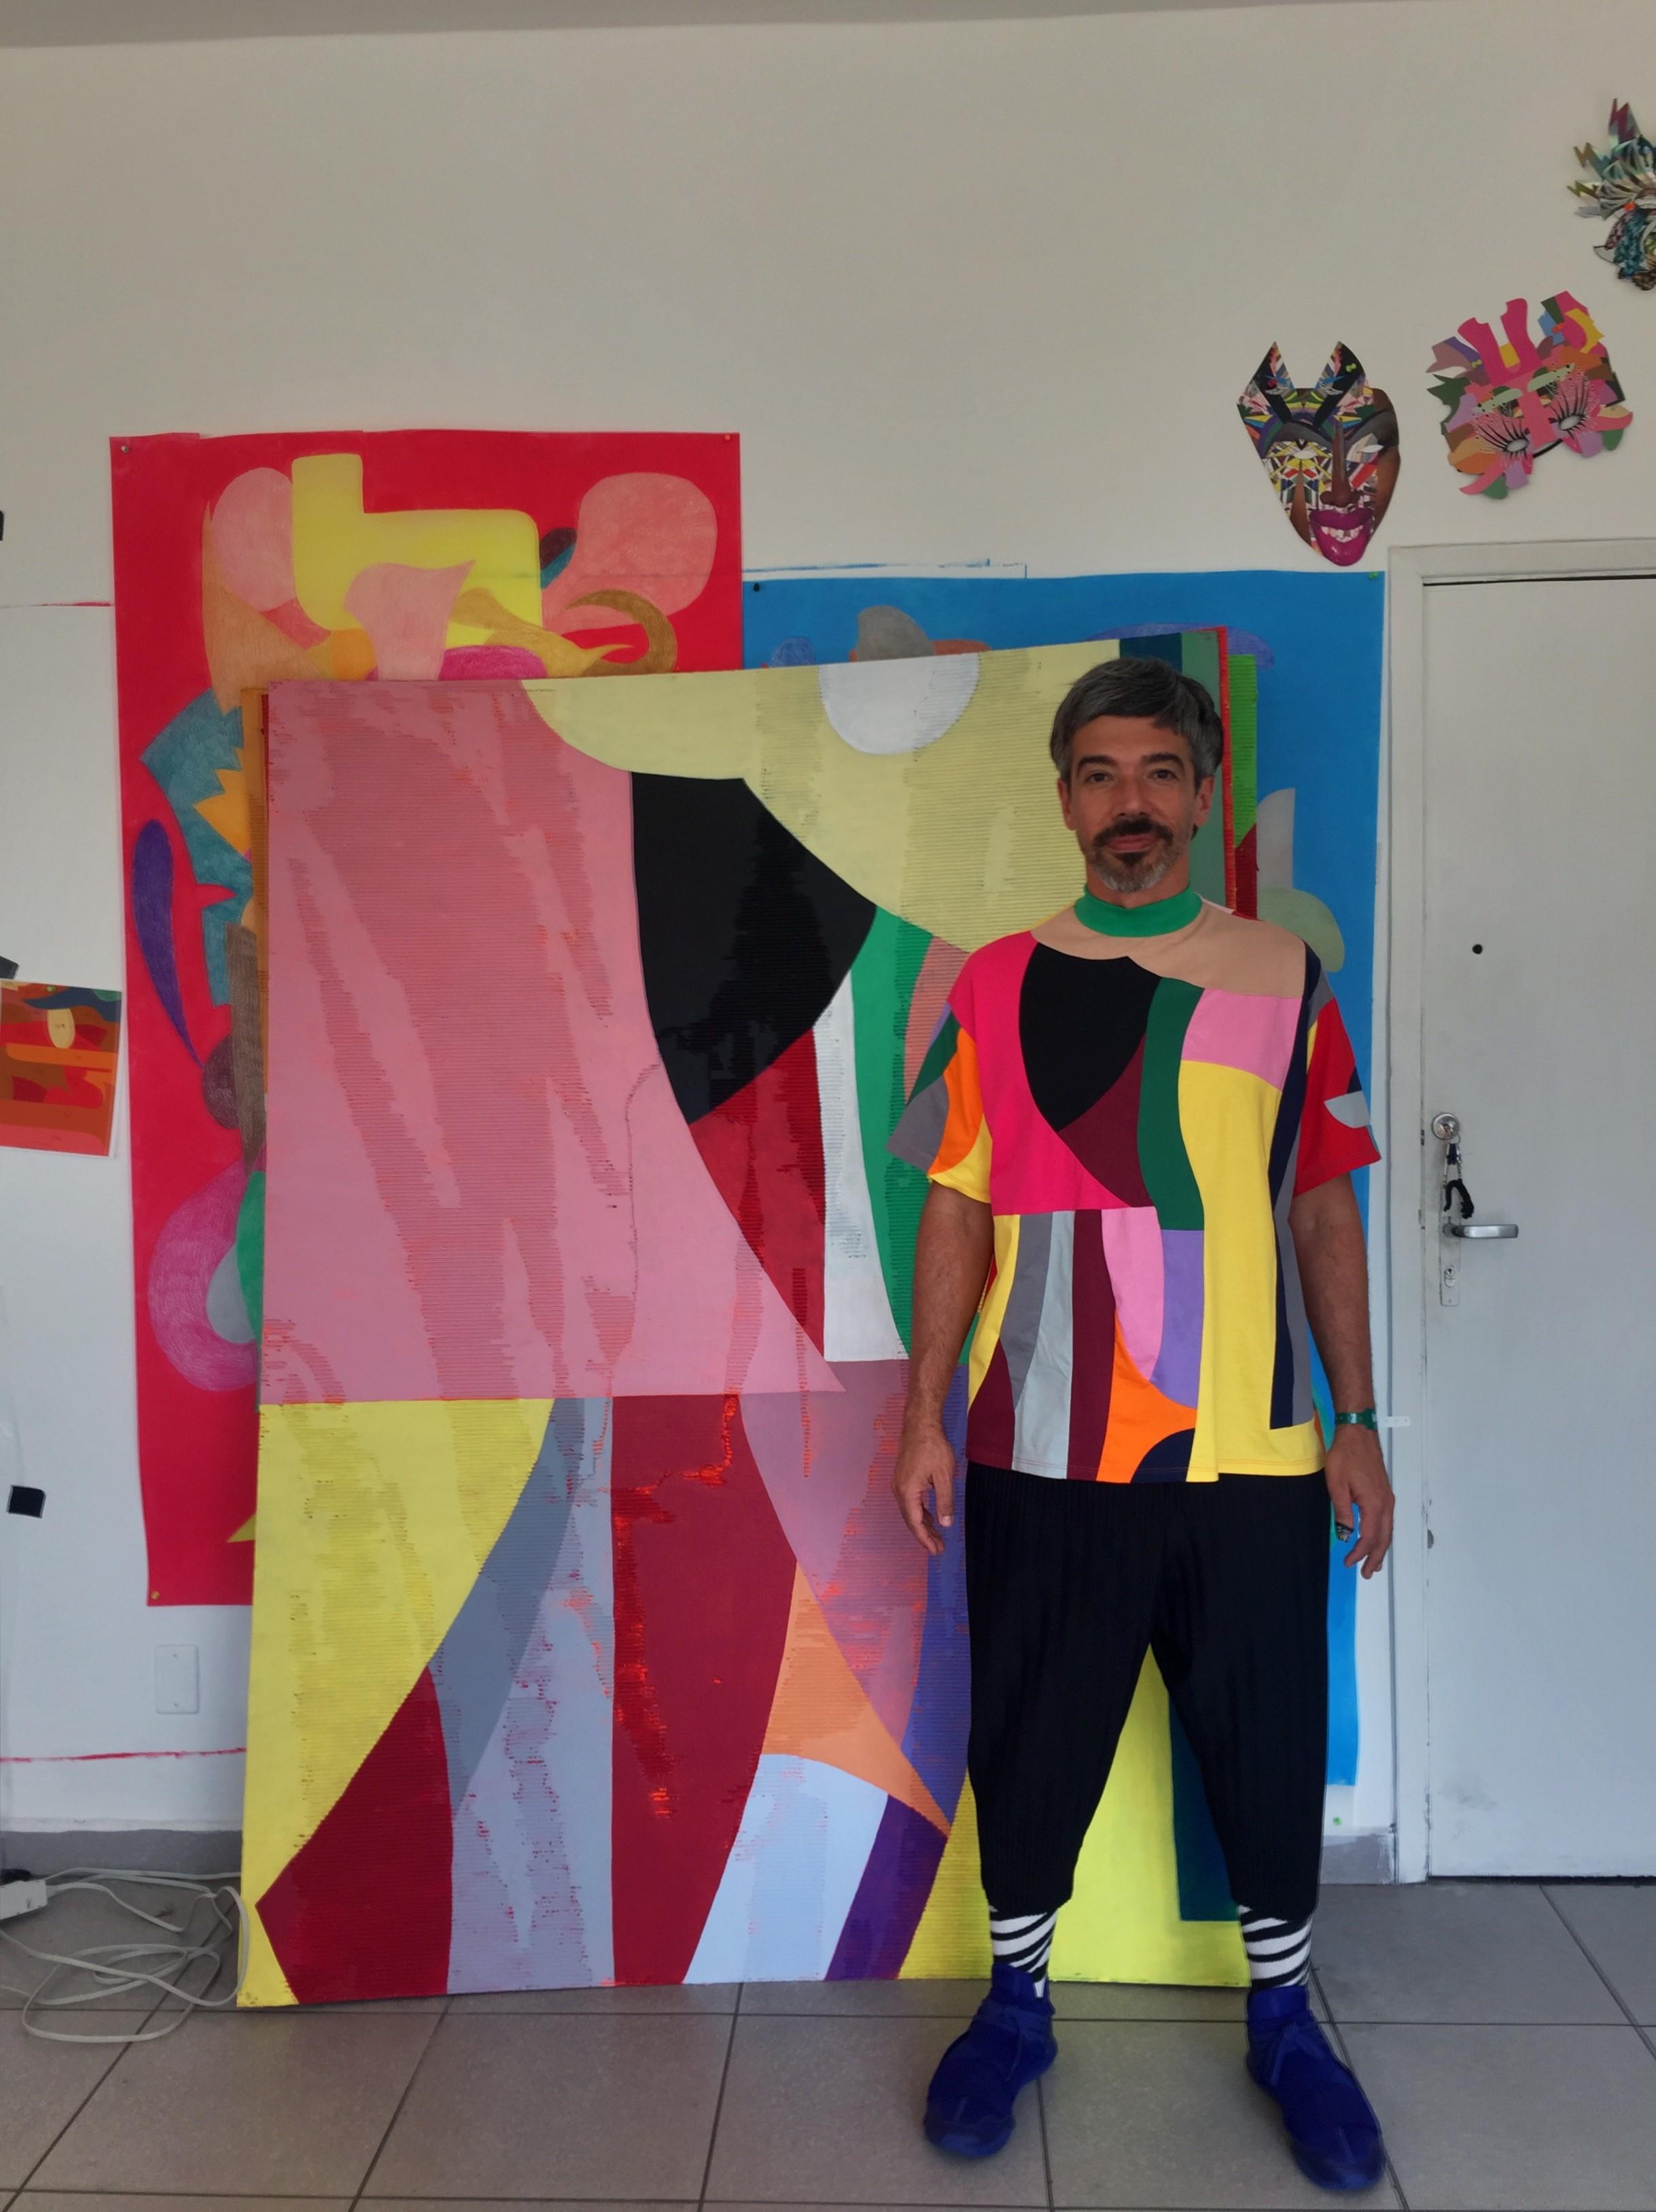 Eli Sudbrack ao lado da sua obra (Cortesia Eli Sudbrack)